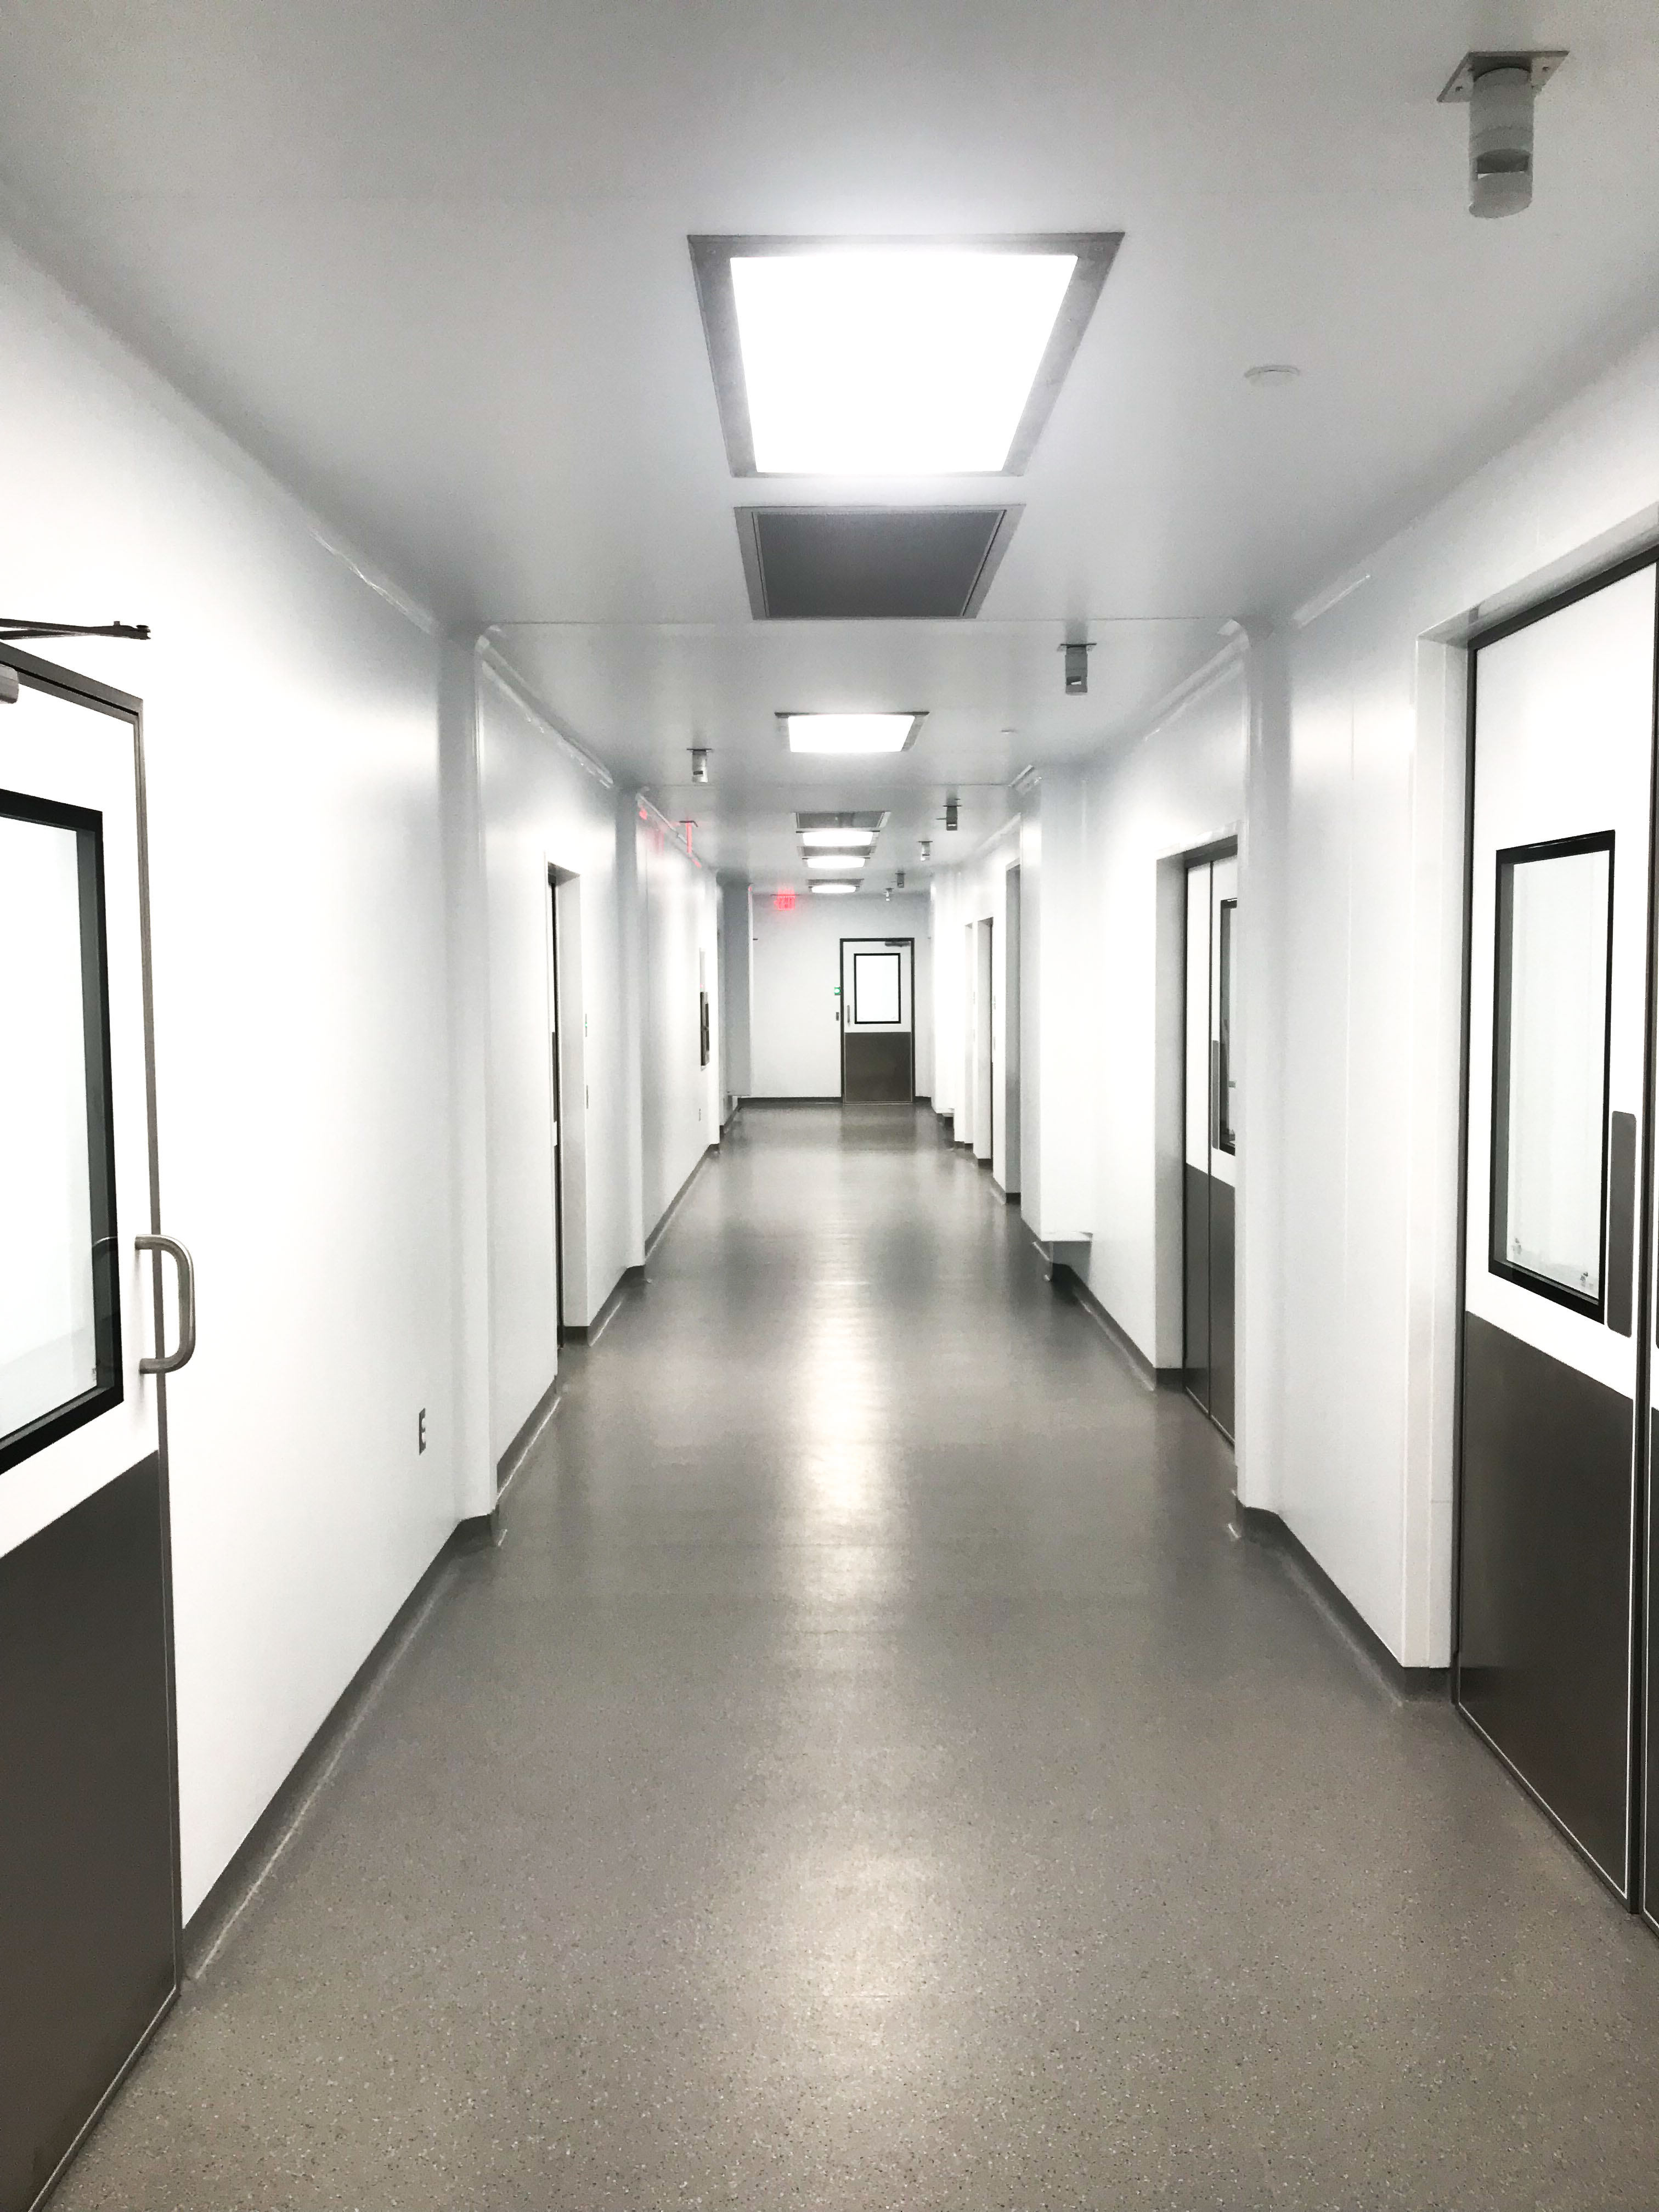 Cleanroom Corridor G-CON PODs